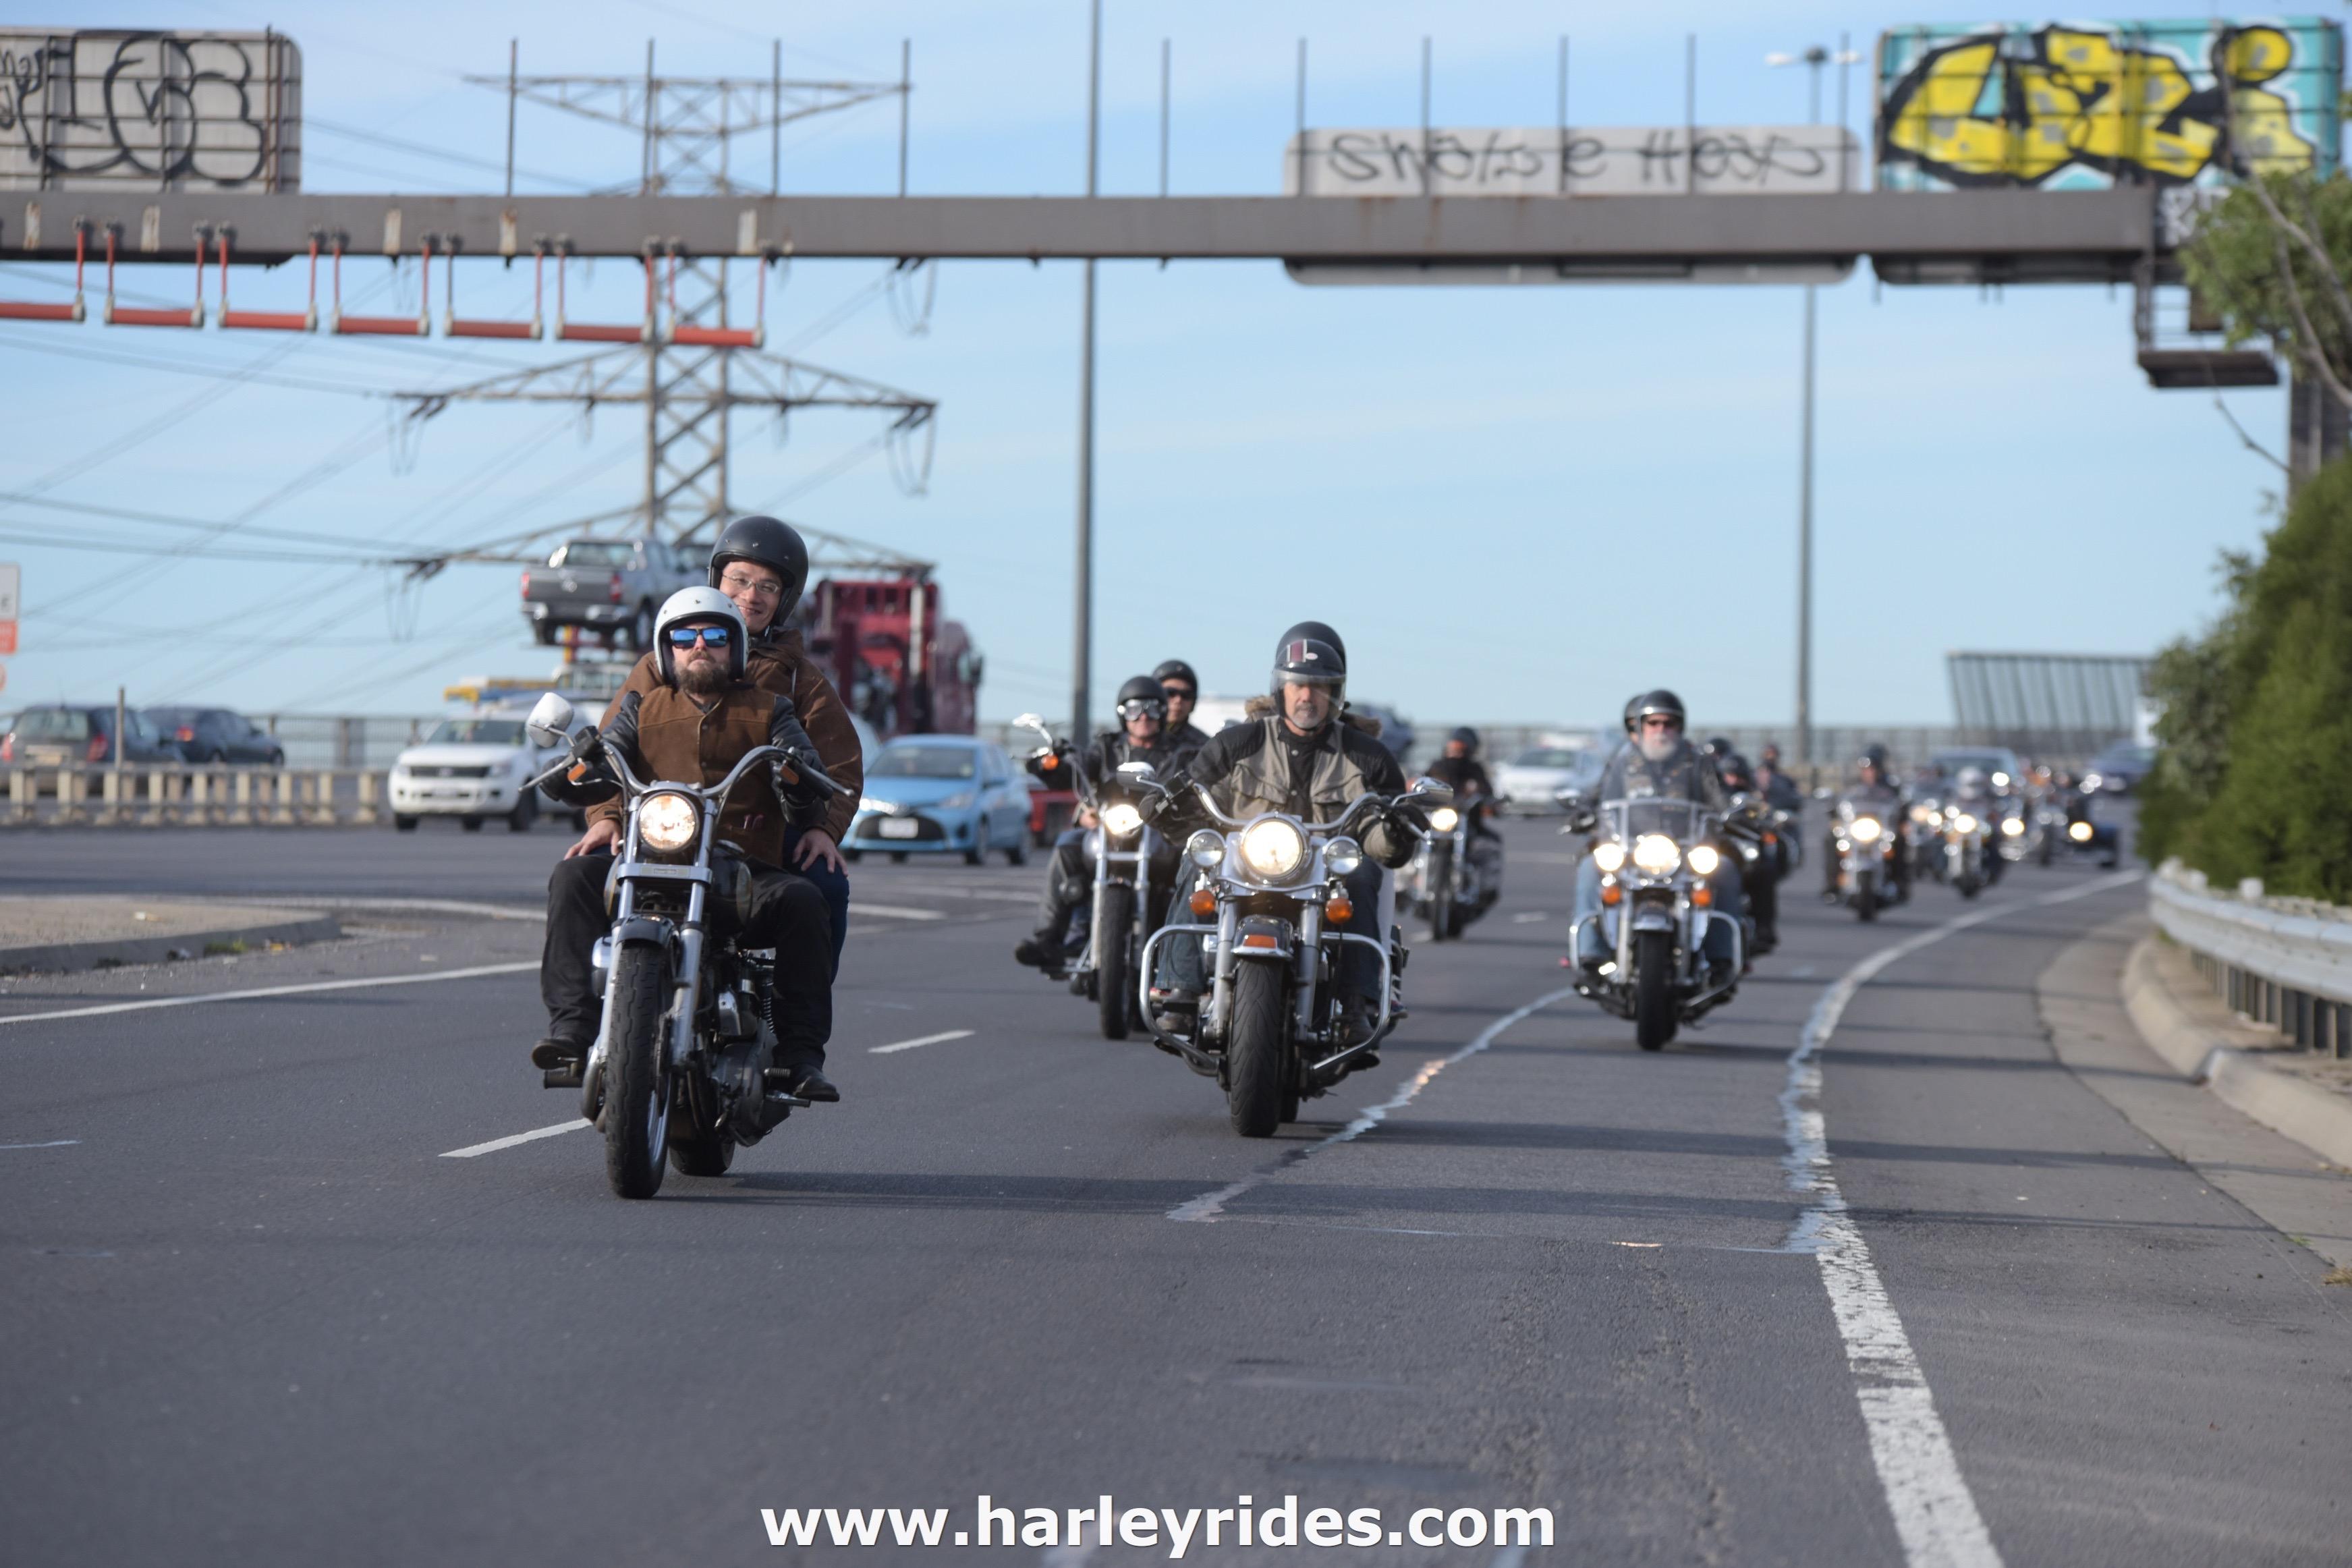 HarleyDavidsonGroupRide (37).jpg